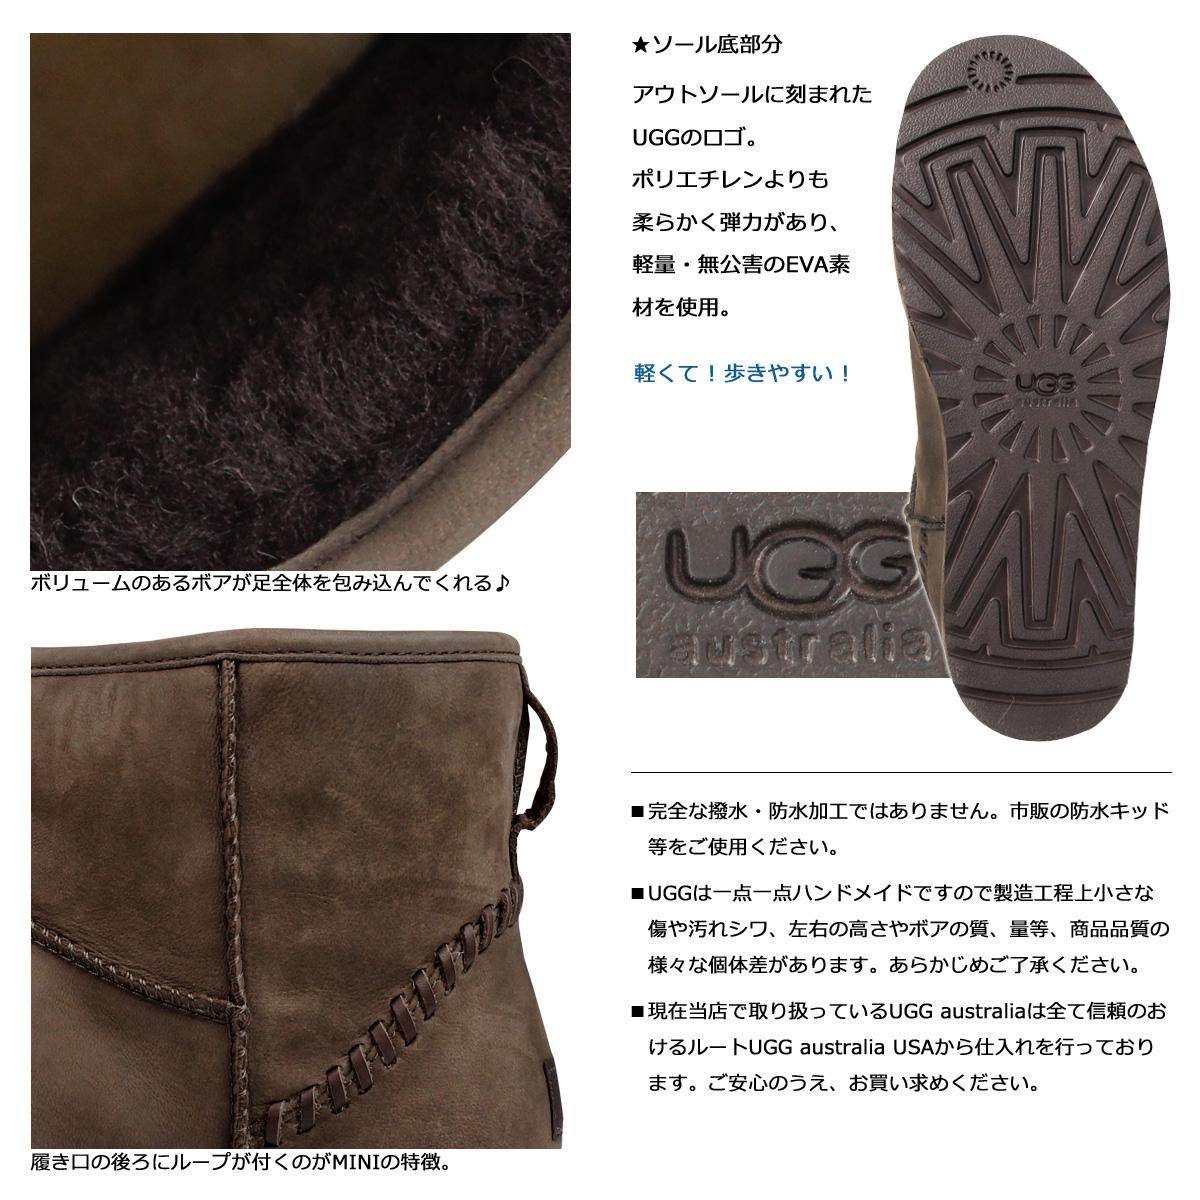 b41f248dd39 UGG UGG men's MENS CLASSIC MINI DECO CAPRA Sheepskin Boots Classic mini  Deco Capra 1009687 2 color [9/30 new in stock]